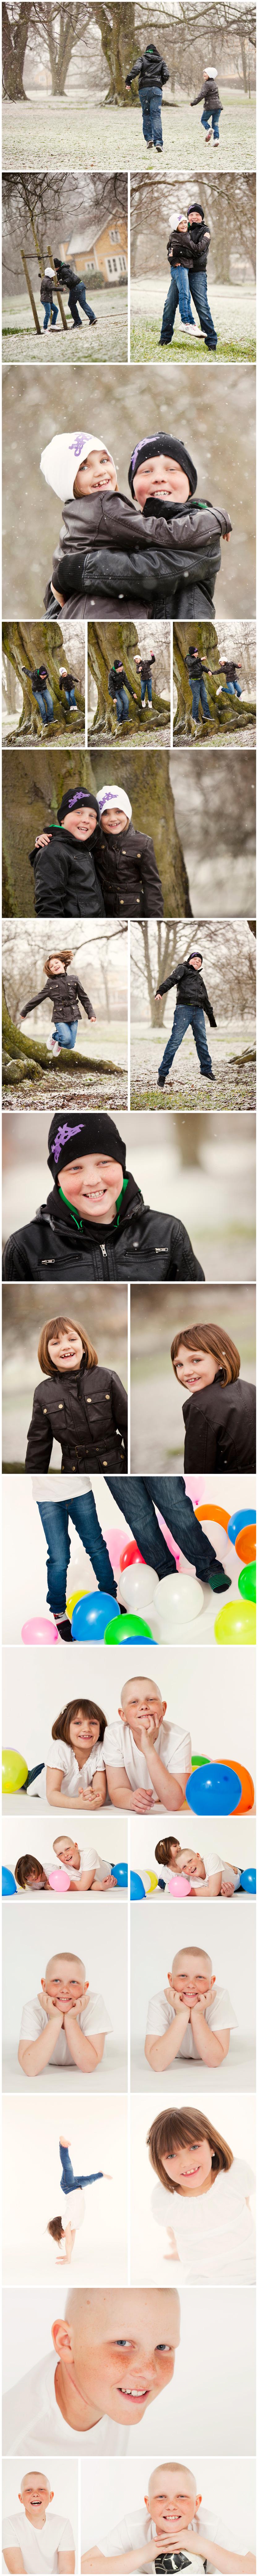 essencevitae, helsingborg, Brunnsparken, Fotograf marie walther, mw photo&design, skåne, porträtt